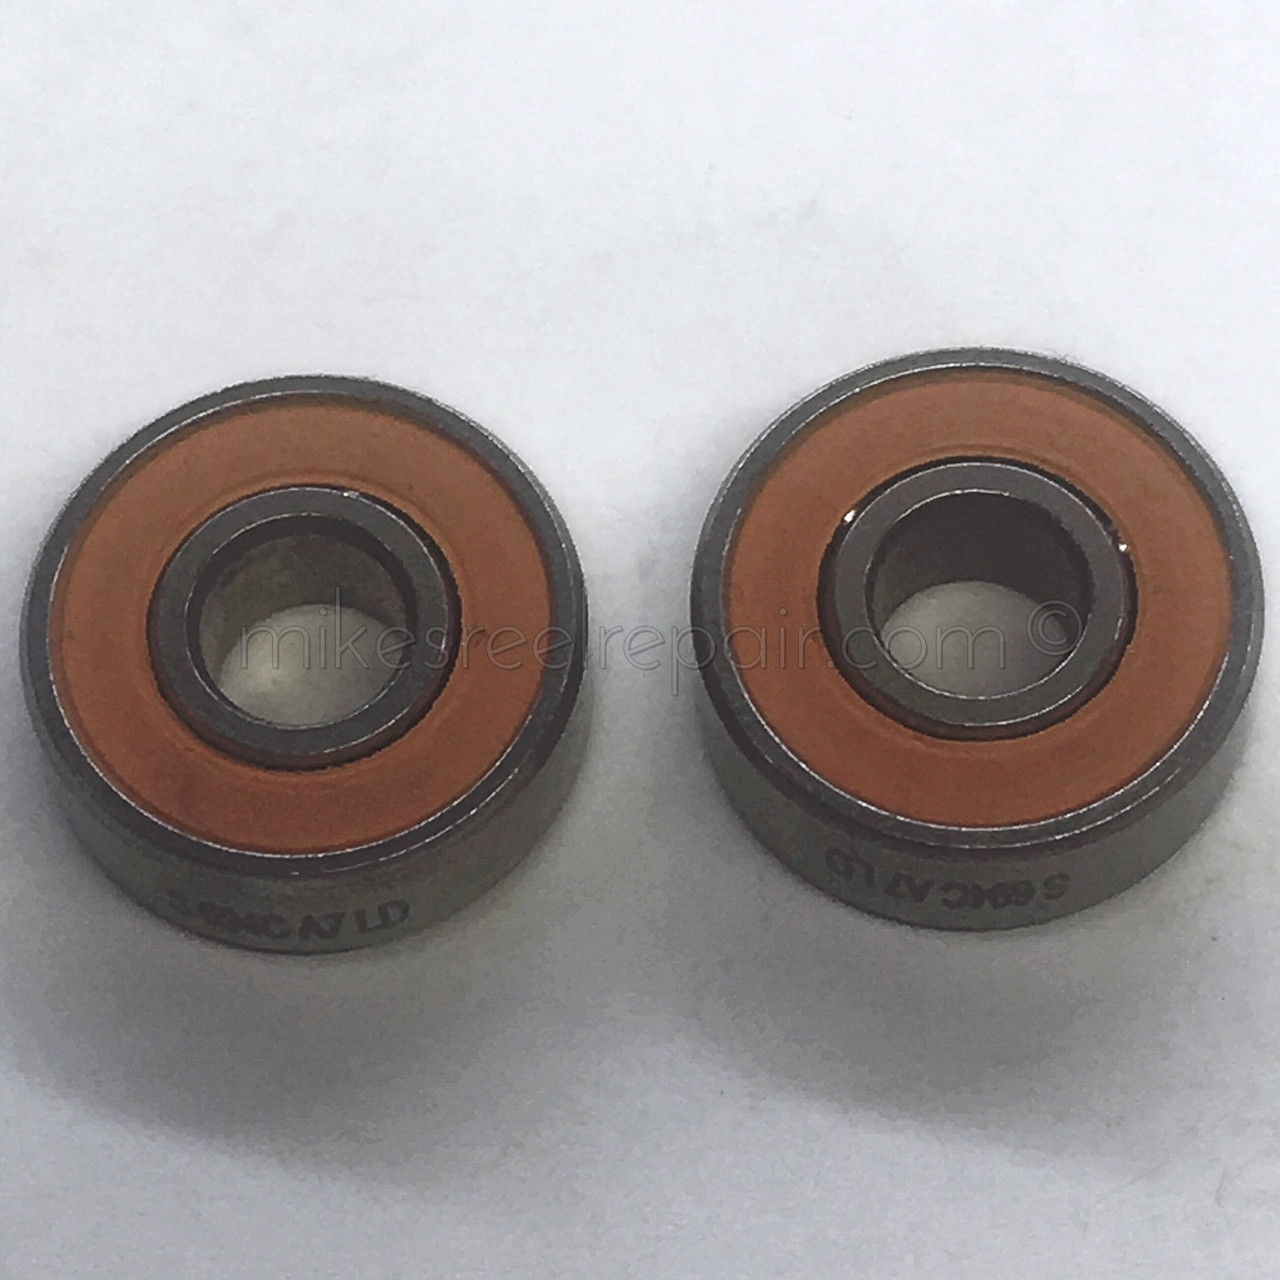 Abu ABEC 7 Ceramic Bearing Upgrade 4x10x4mm. Set of 2 Abu Garcia C Schematic on